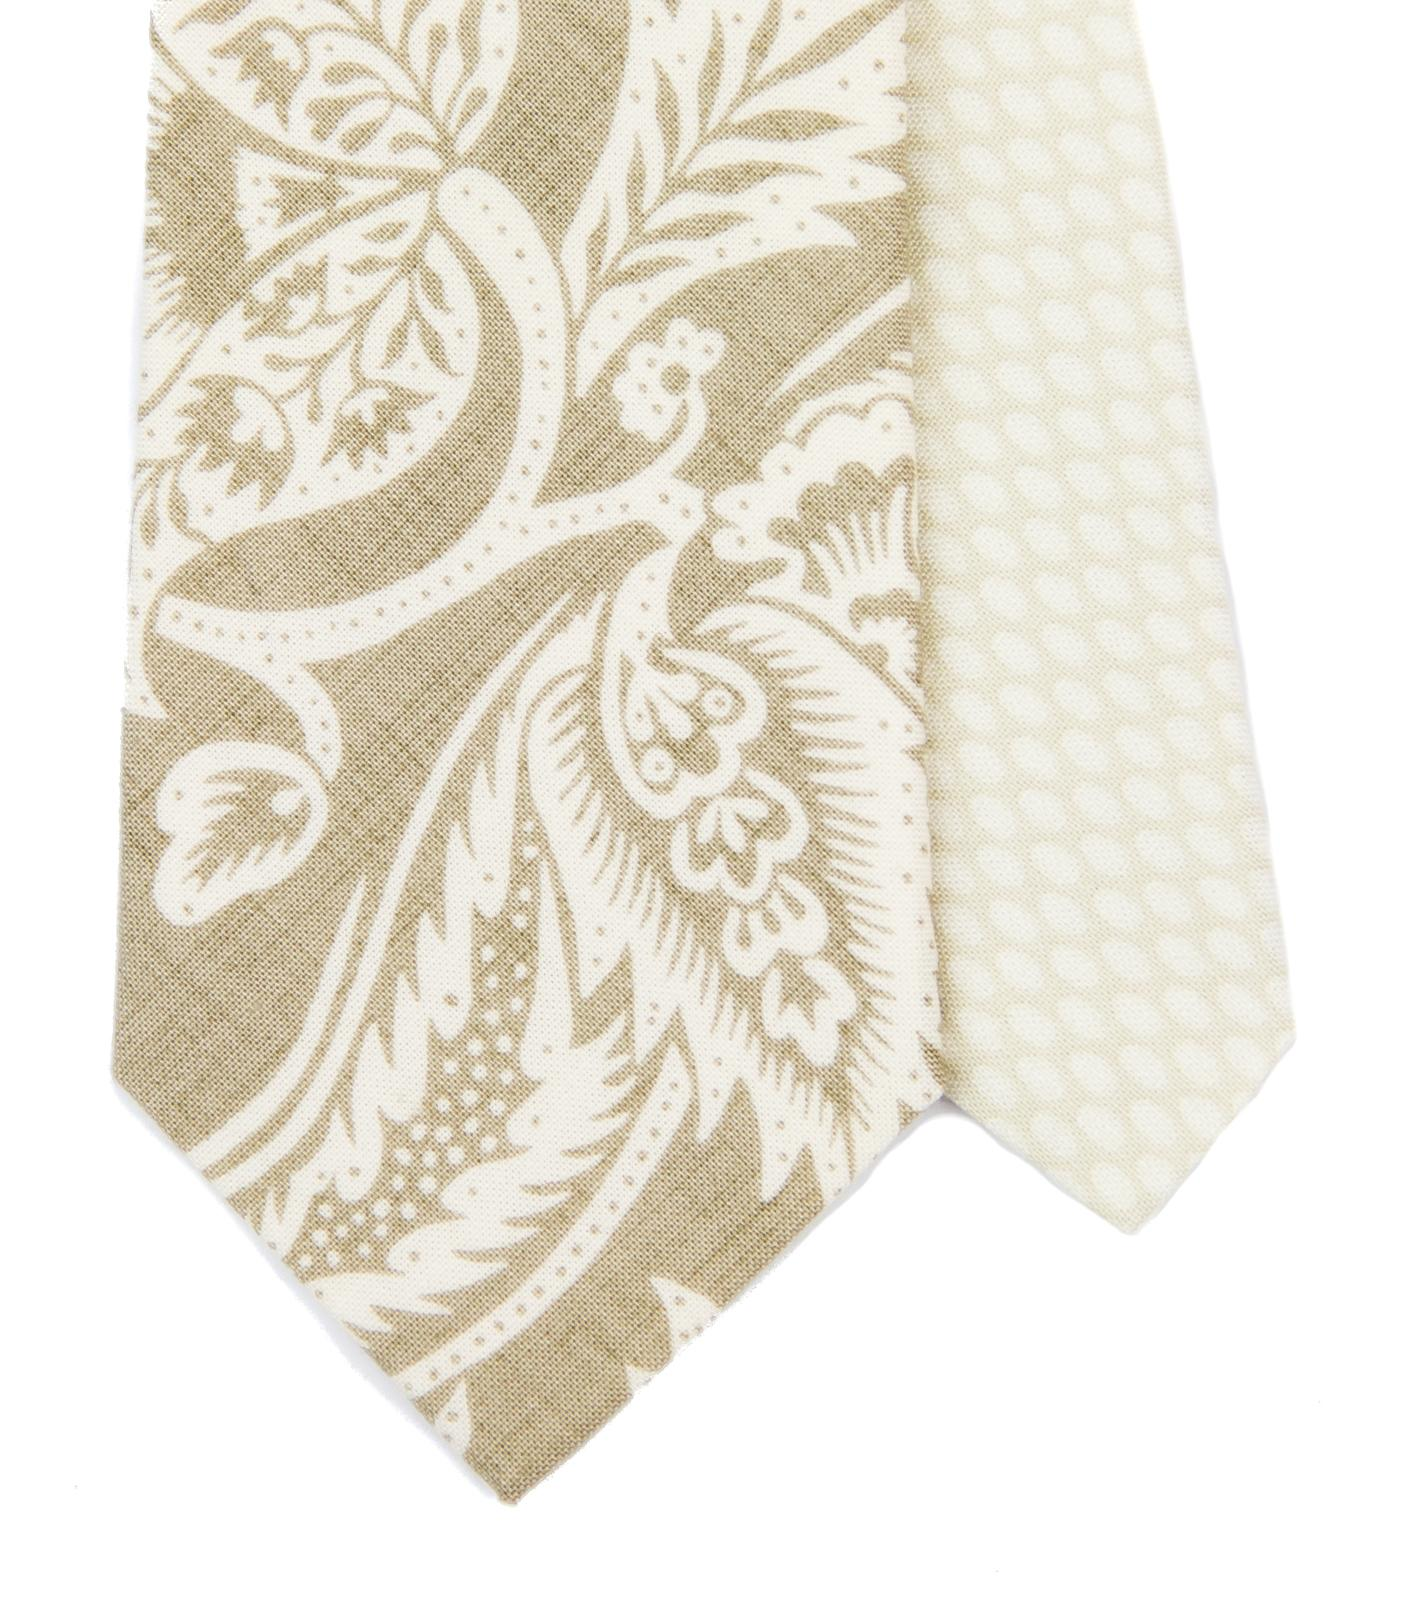 Twin kravata béžová s ornamentem - Obrázok č. 1